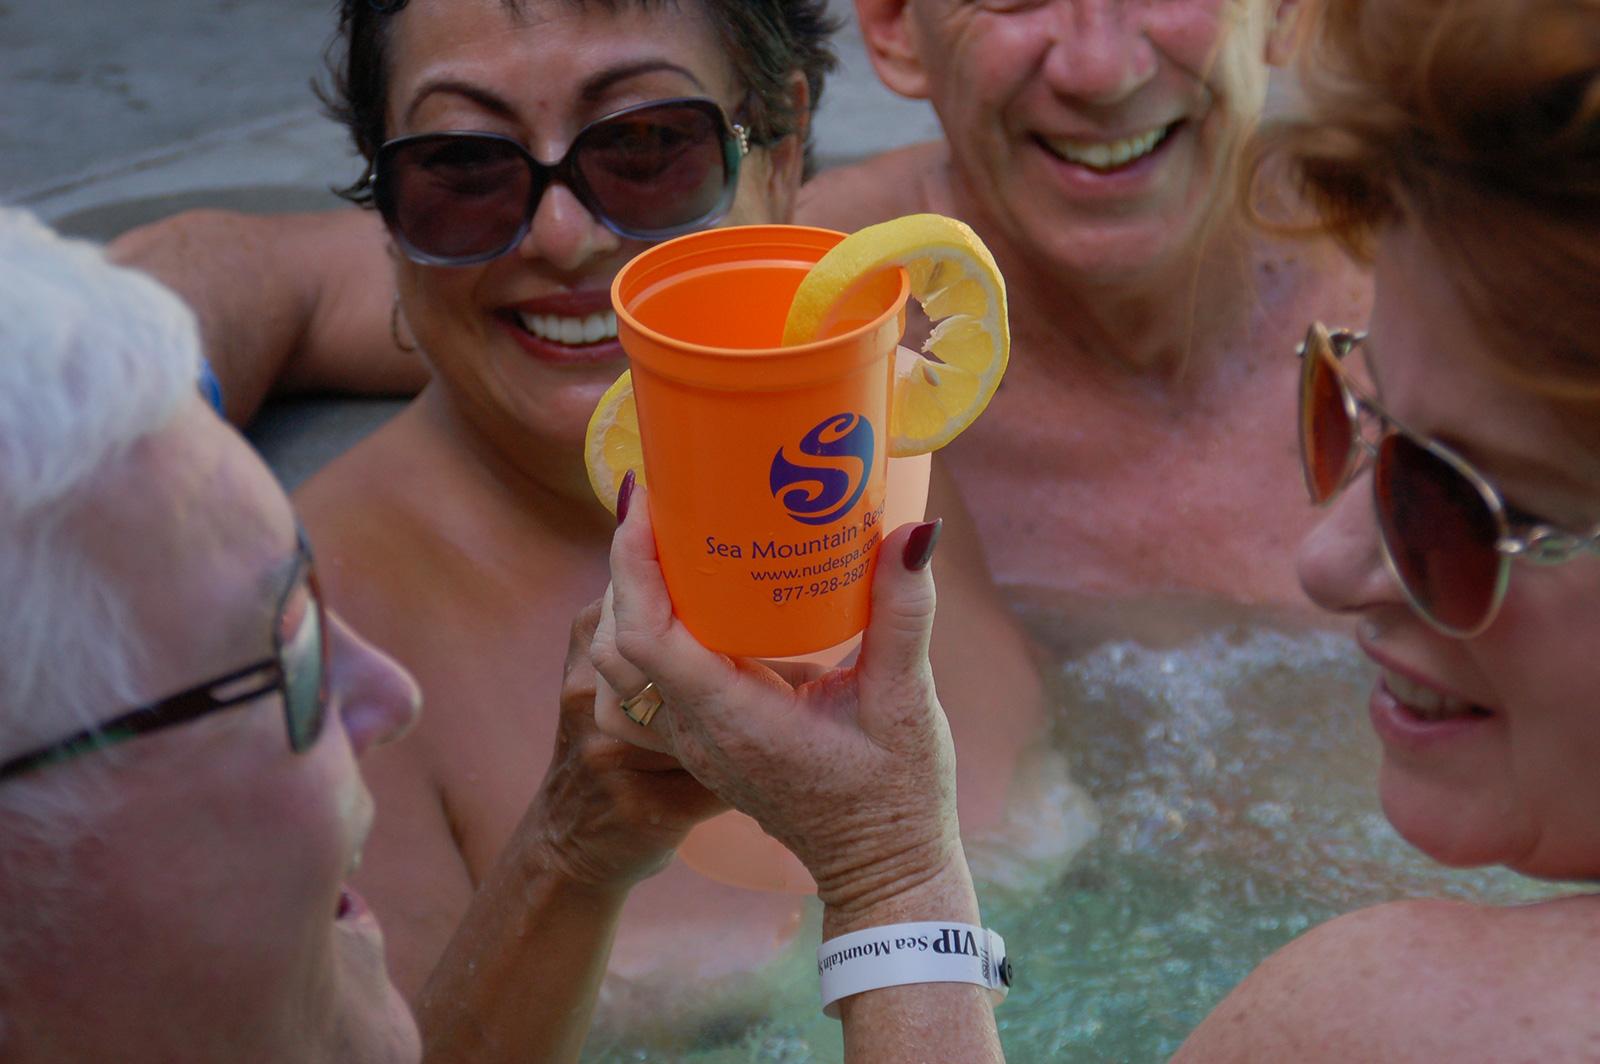 Sea Mountain Nude Lifestyles Spa Resort 760-251-4744